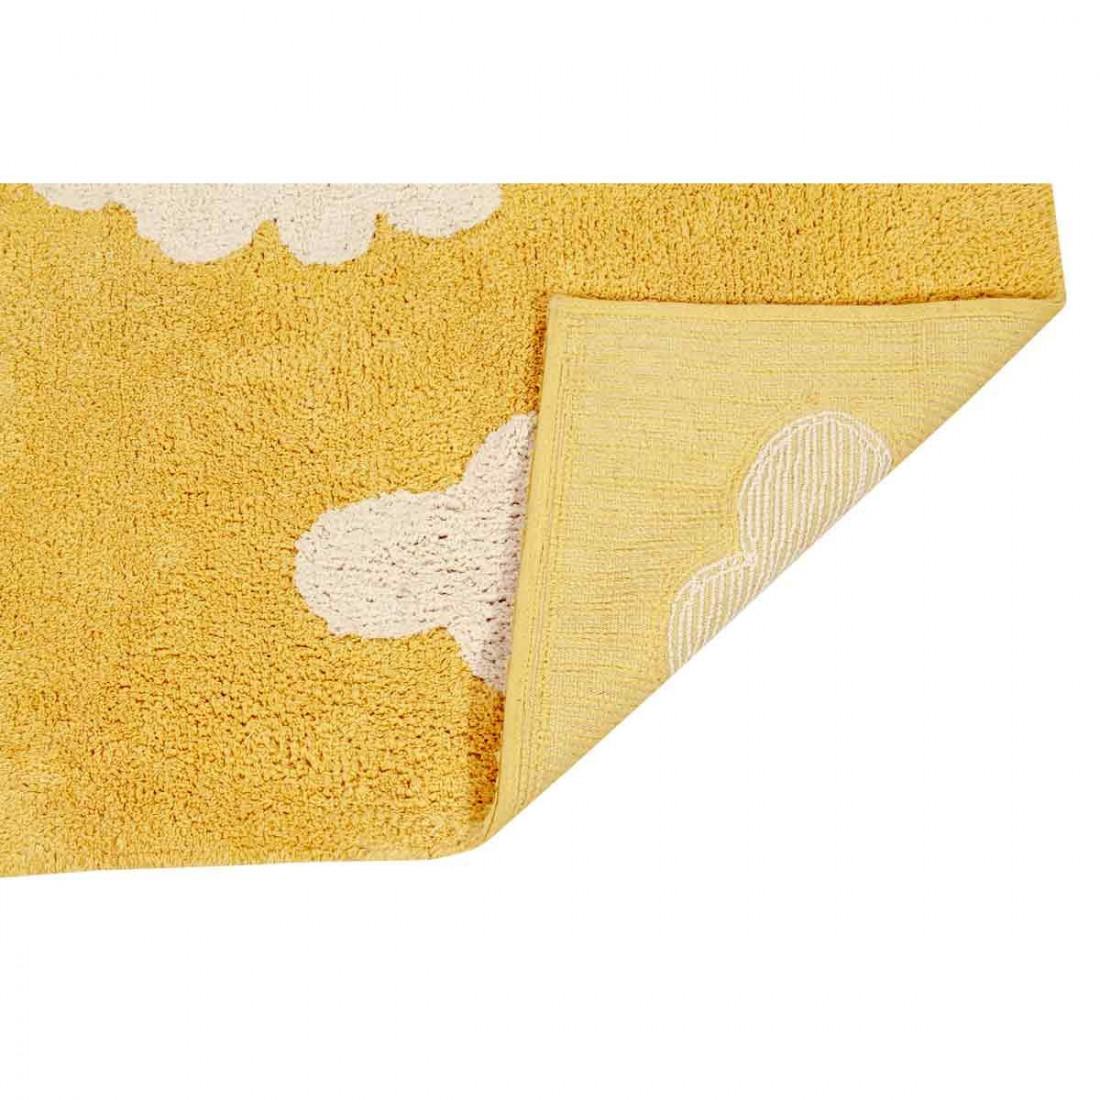 cool tapis enfant coton lavable jaune moutarde nuages blanc lorena canals with tapis nuage blanc. Black Bedroom Furniture Sets. Home Design Ideas